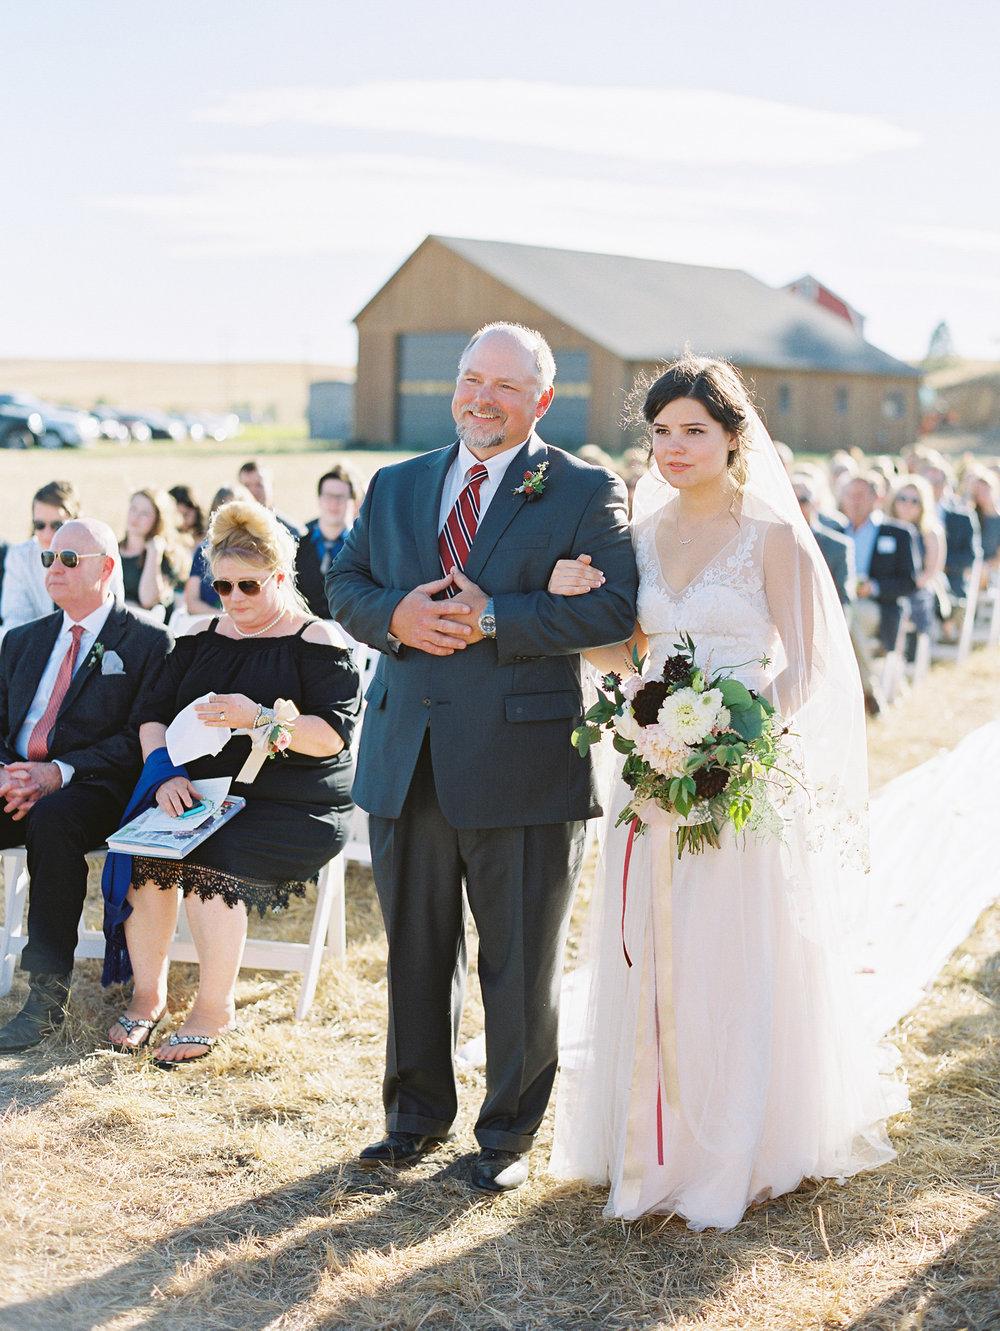 Idaho-Field-Forest-Wedding-Film-Photographer-Kristina-Adams-546.jpg